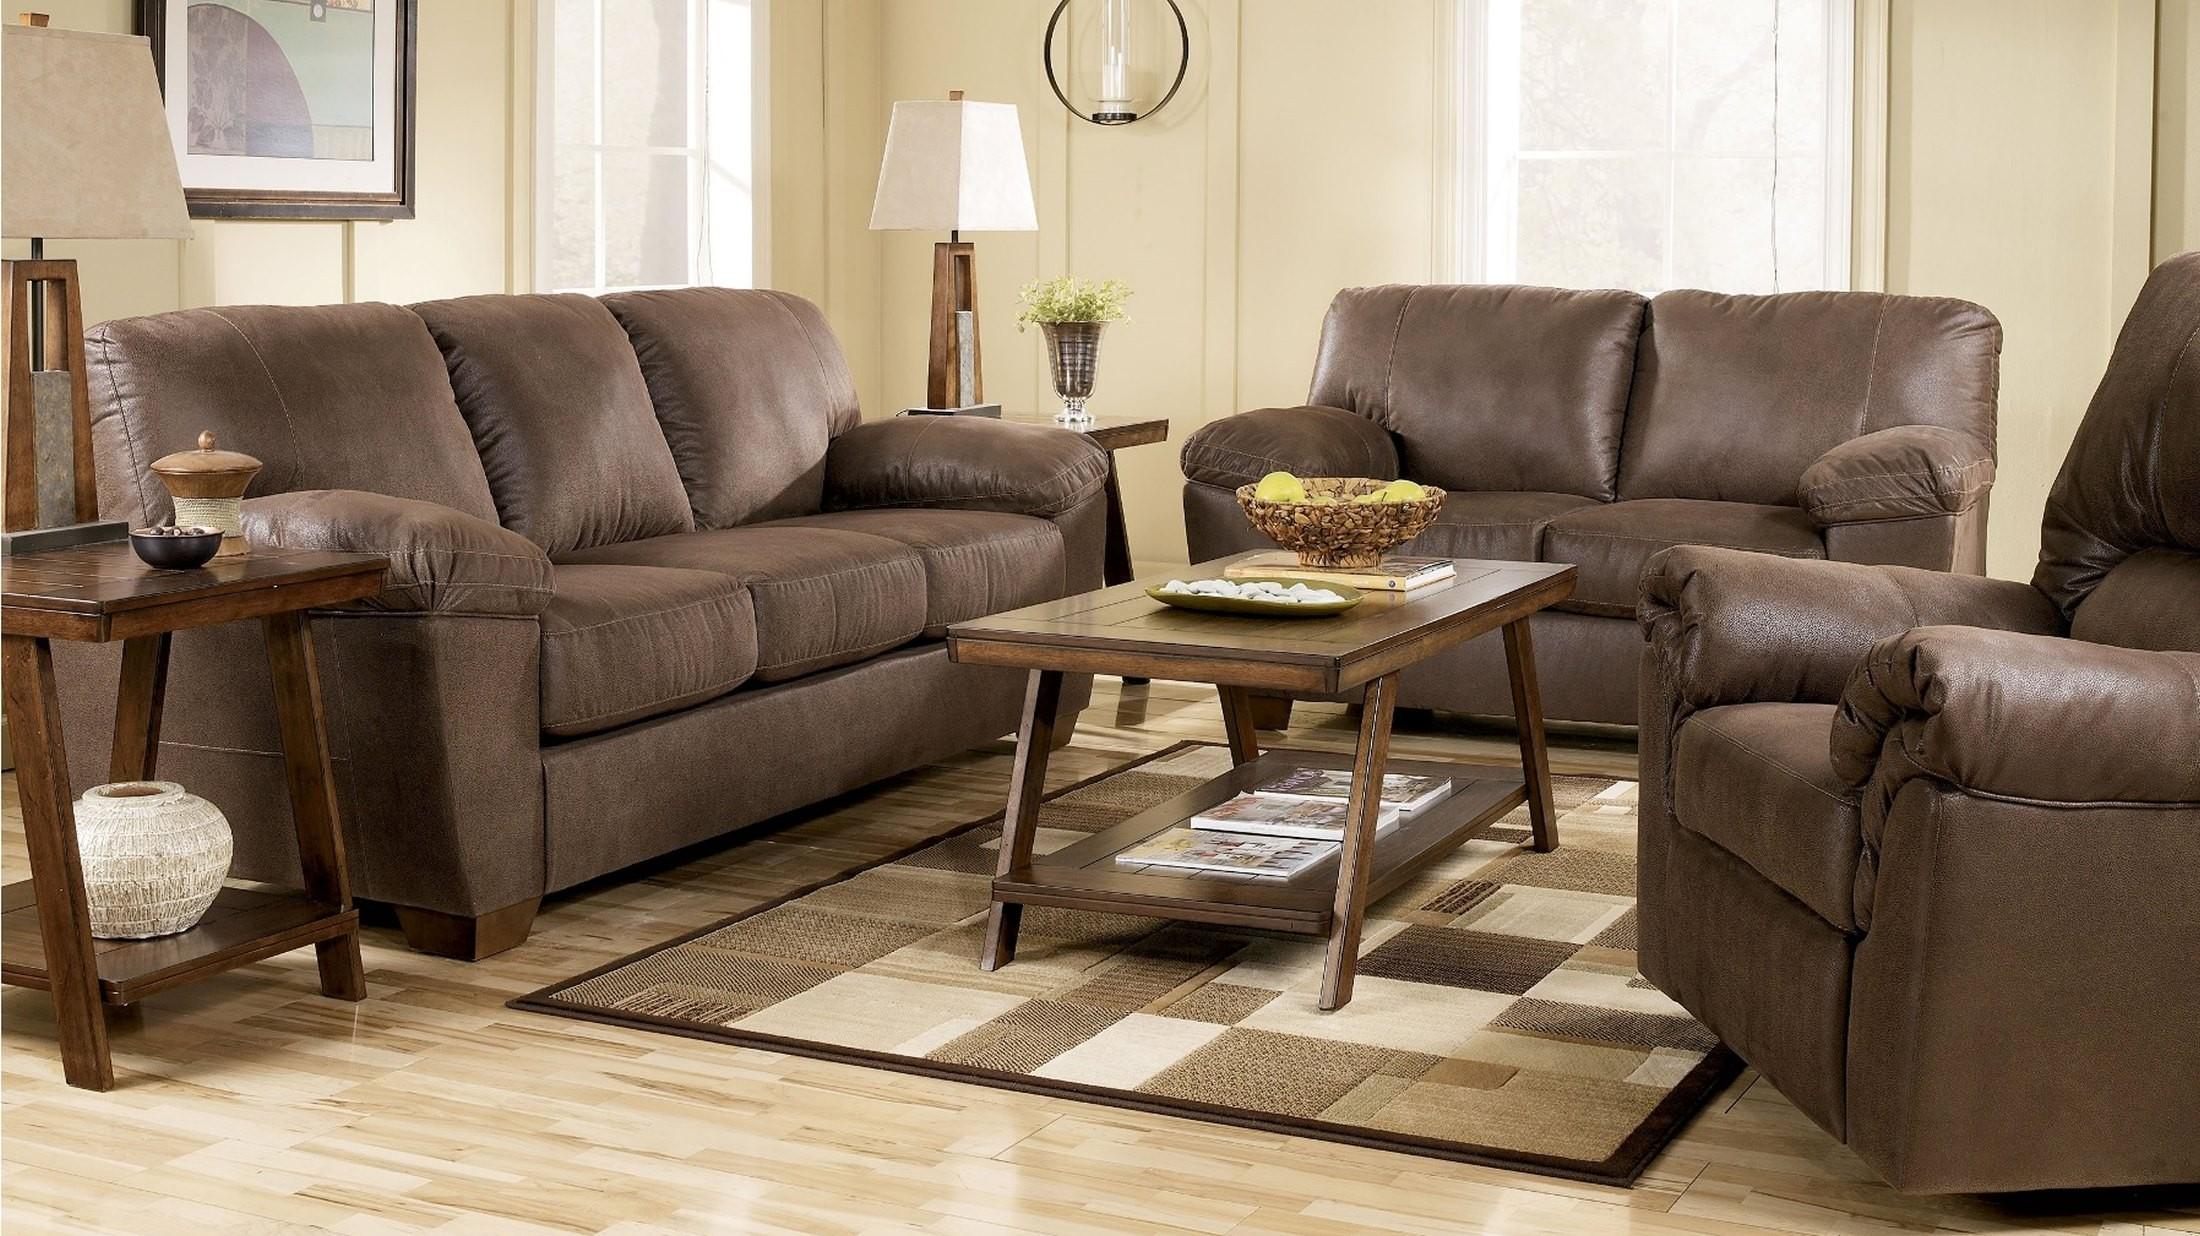 Amazon Walnut Living Room Set from Ashley 67505